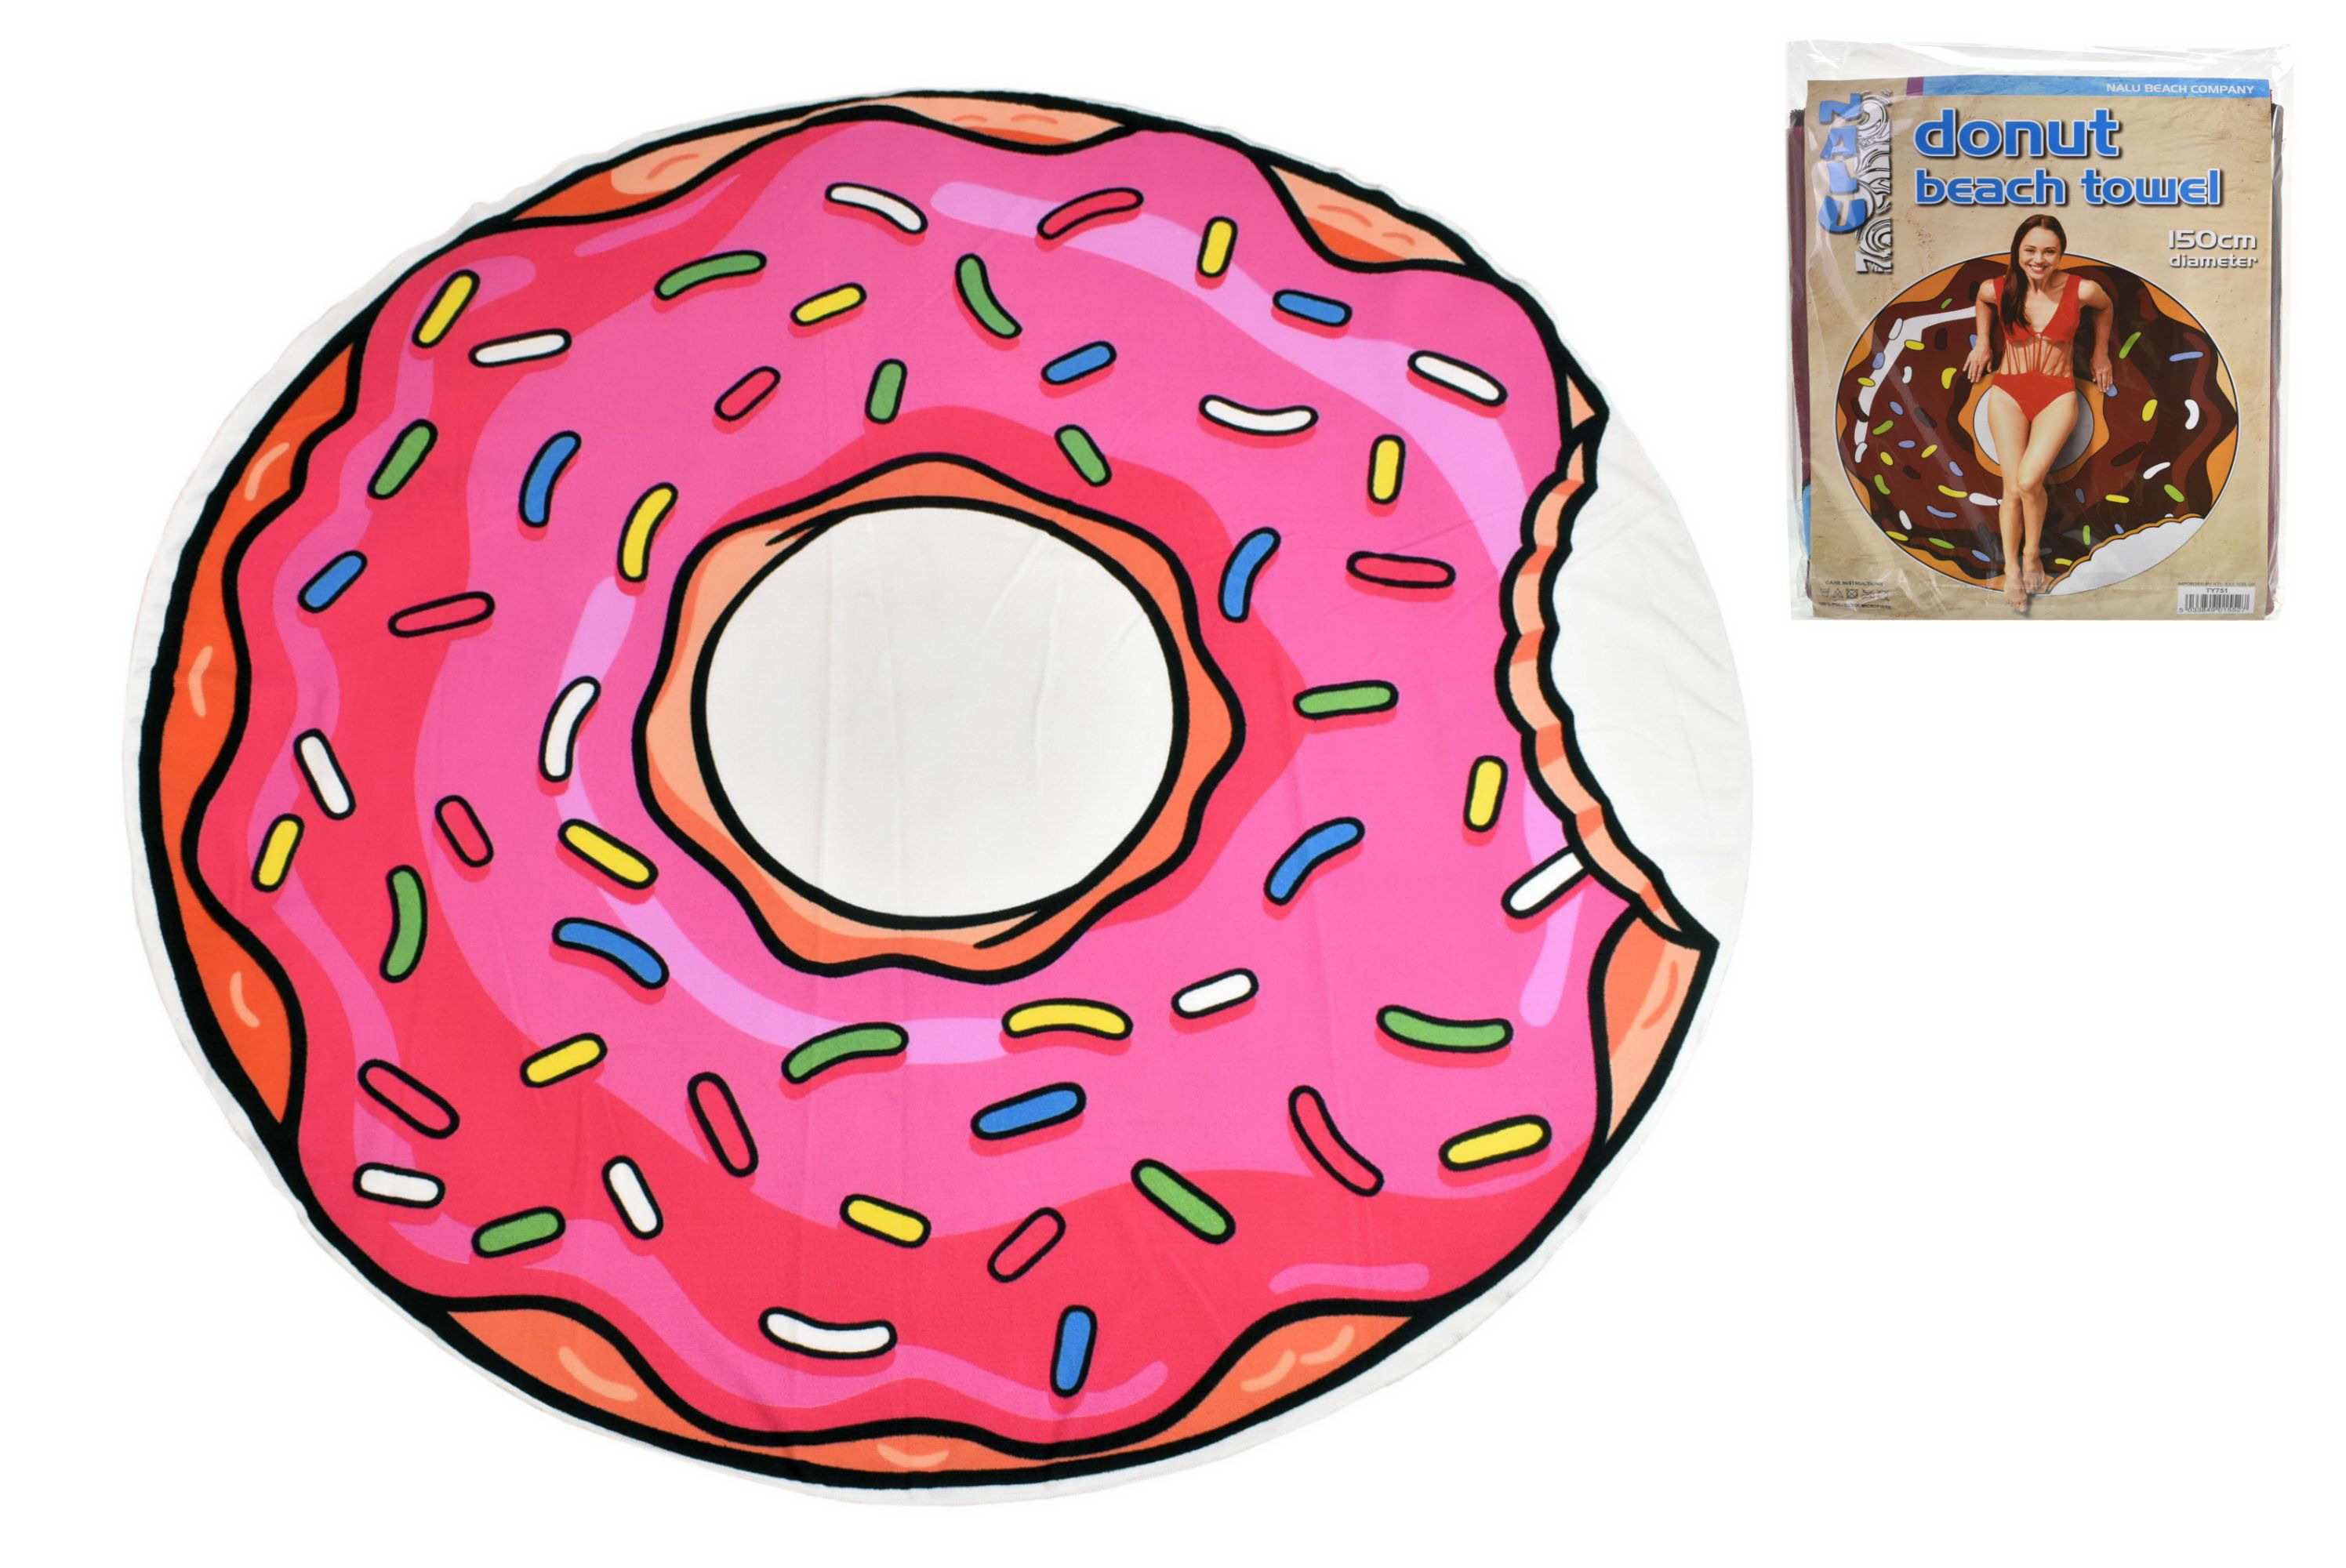 150cm Round Microfibre Towel 180gsm 2 Asst Donuts